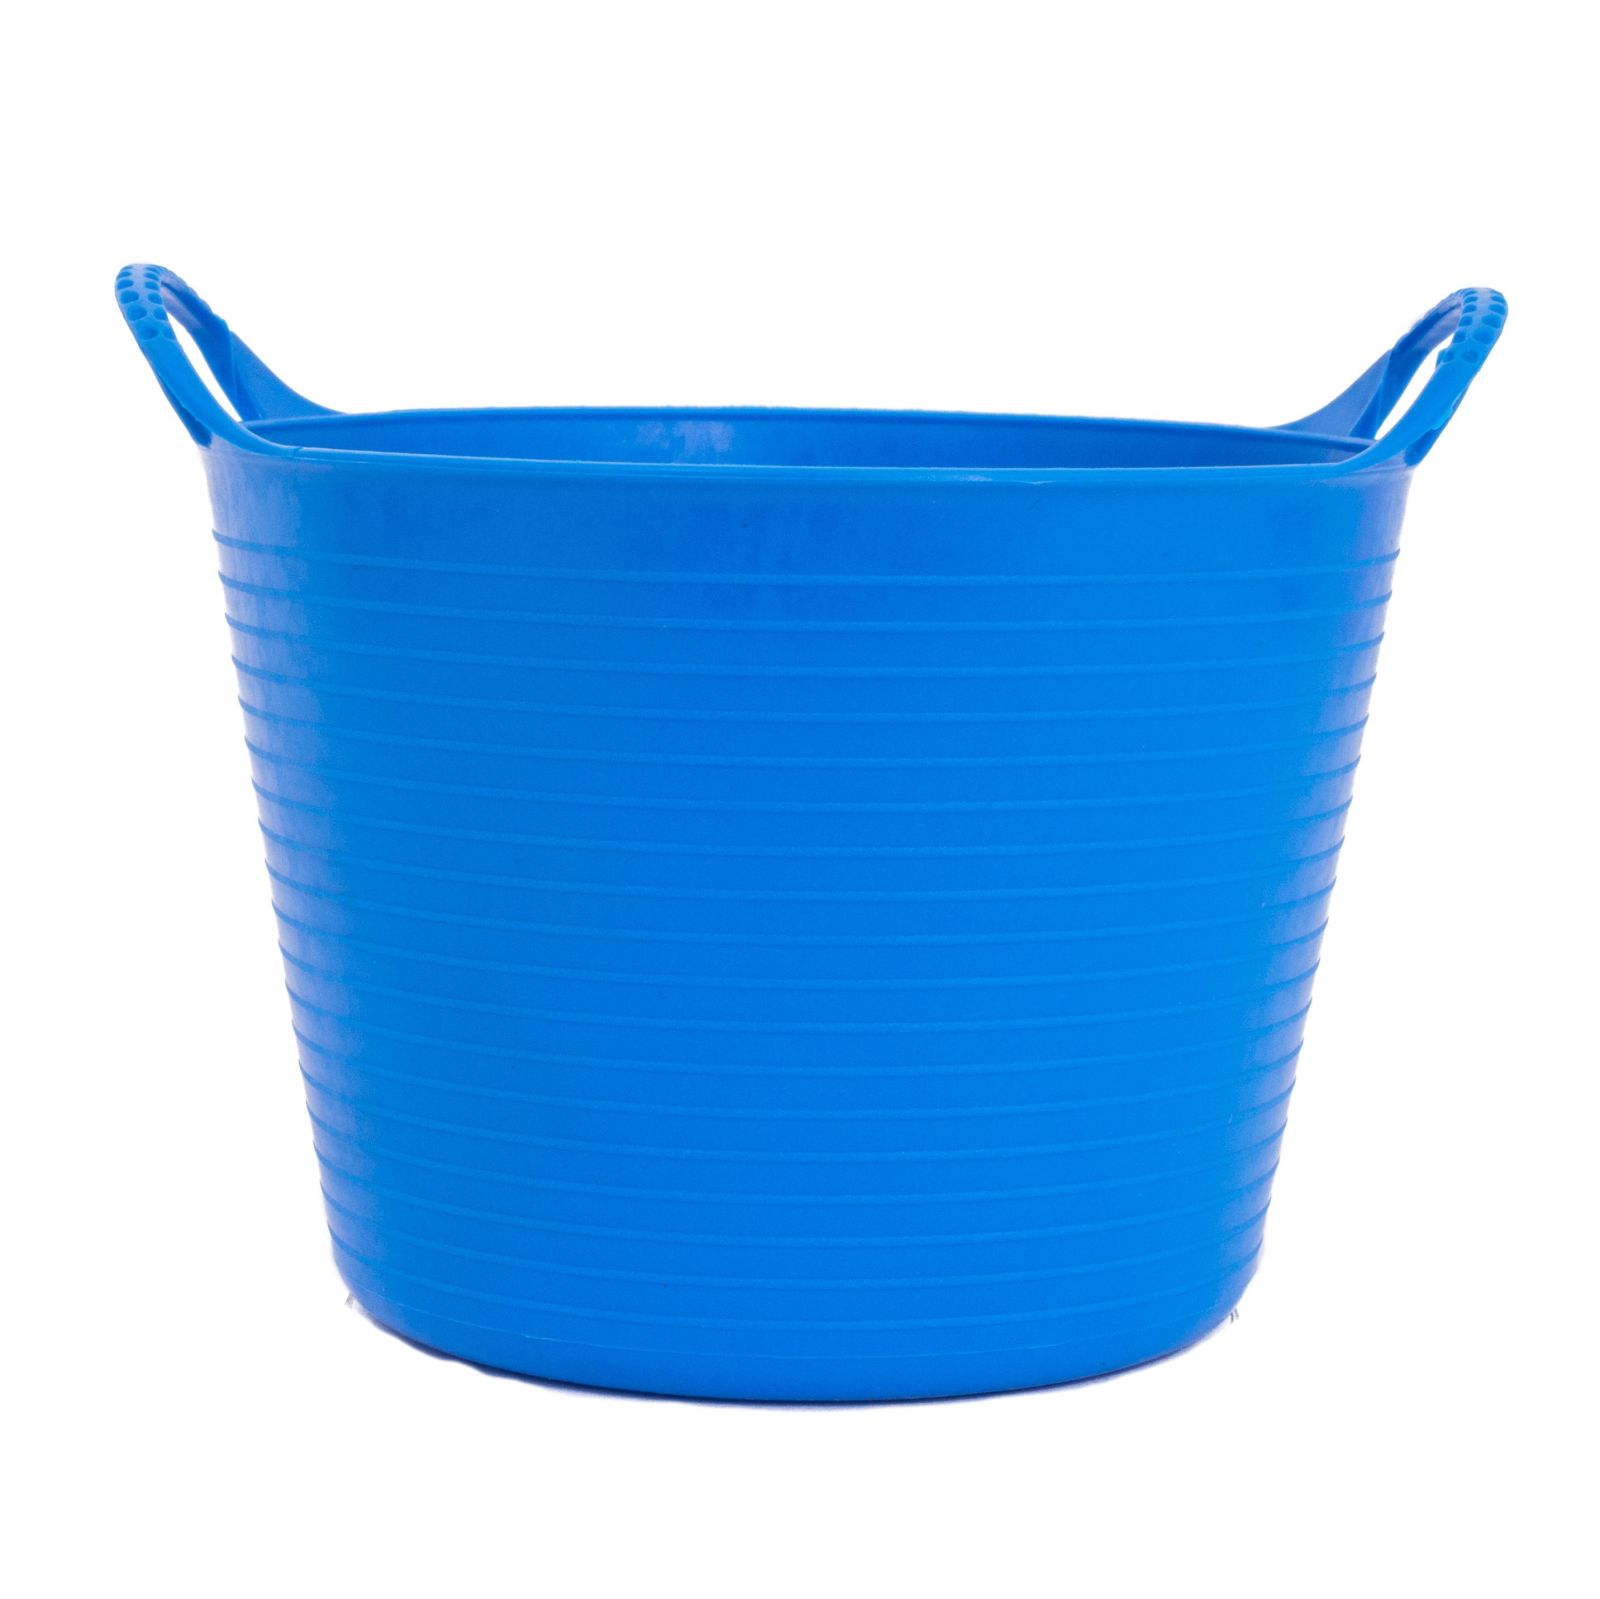 MICRO GORILLA TUB® 370ml